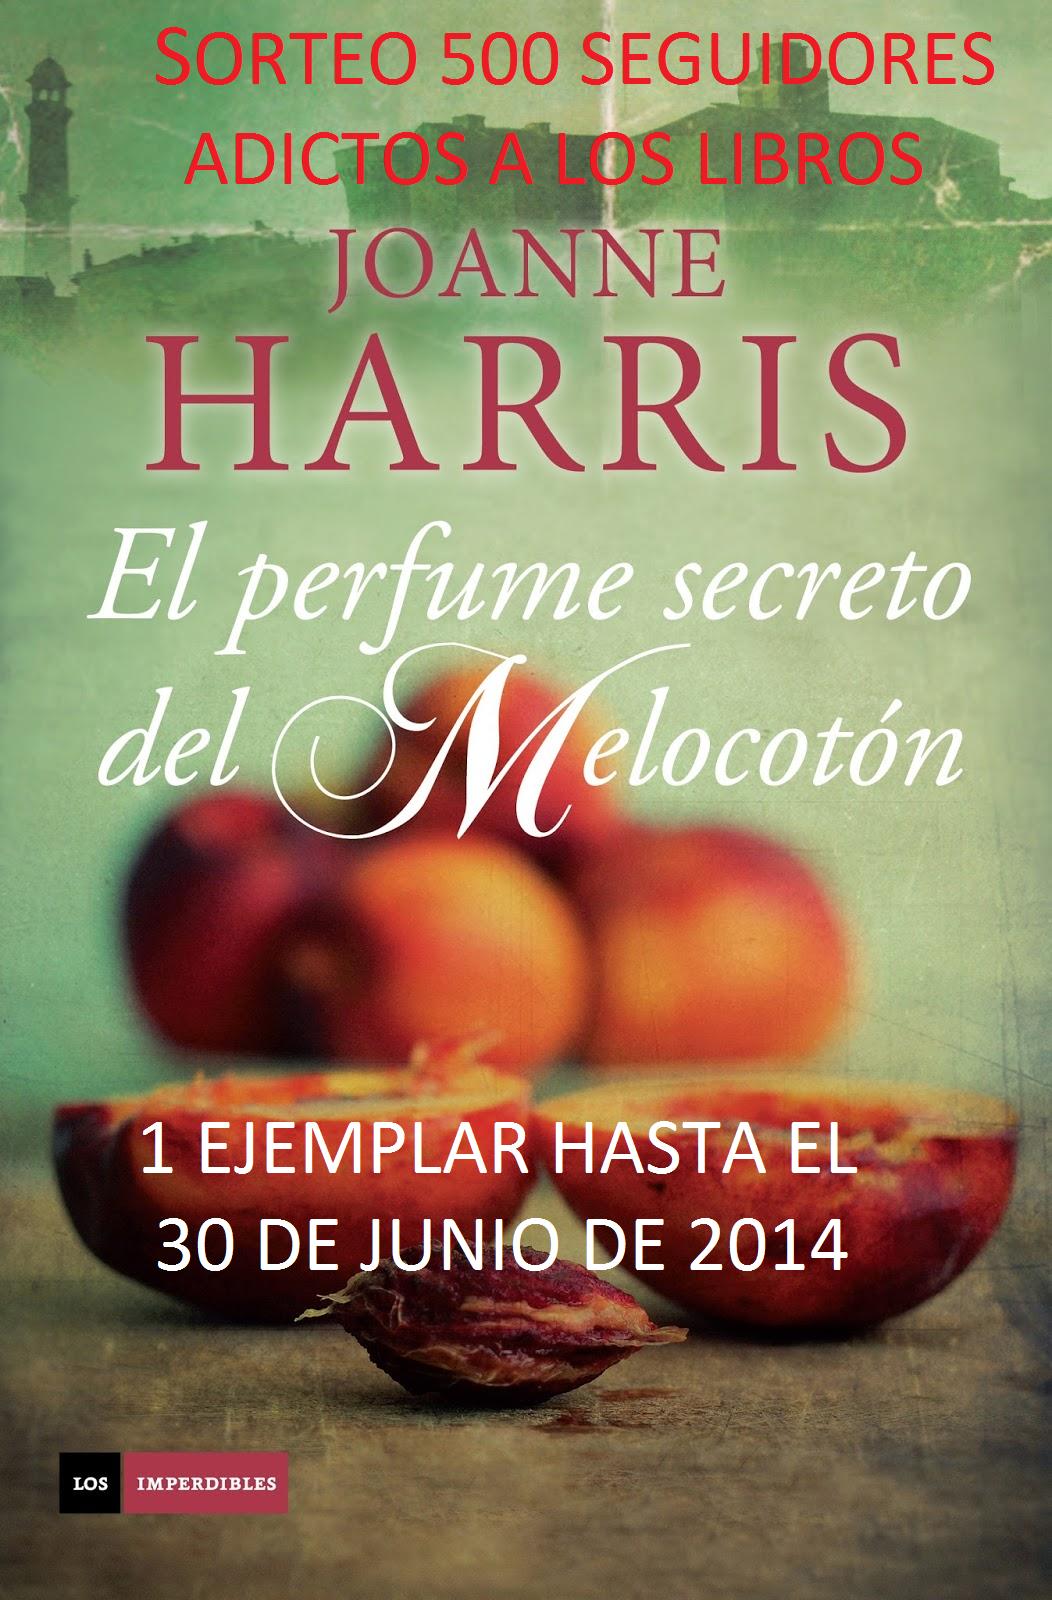 http://megustaloslibros.blogspot.com.es/2014/06/sorteo-melocoton.html